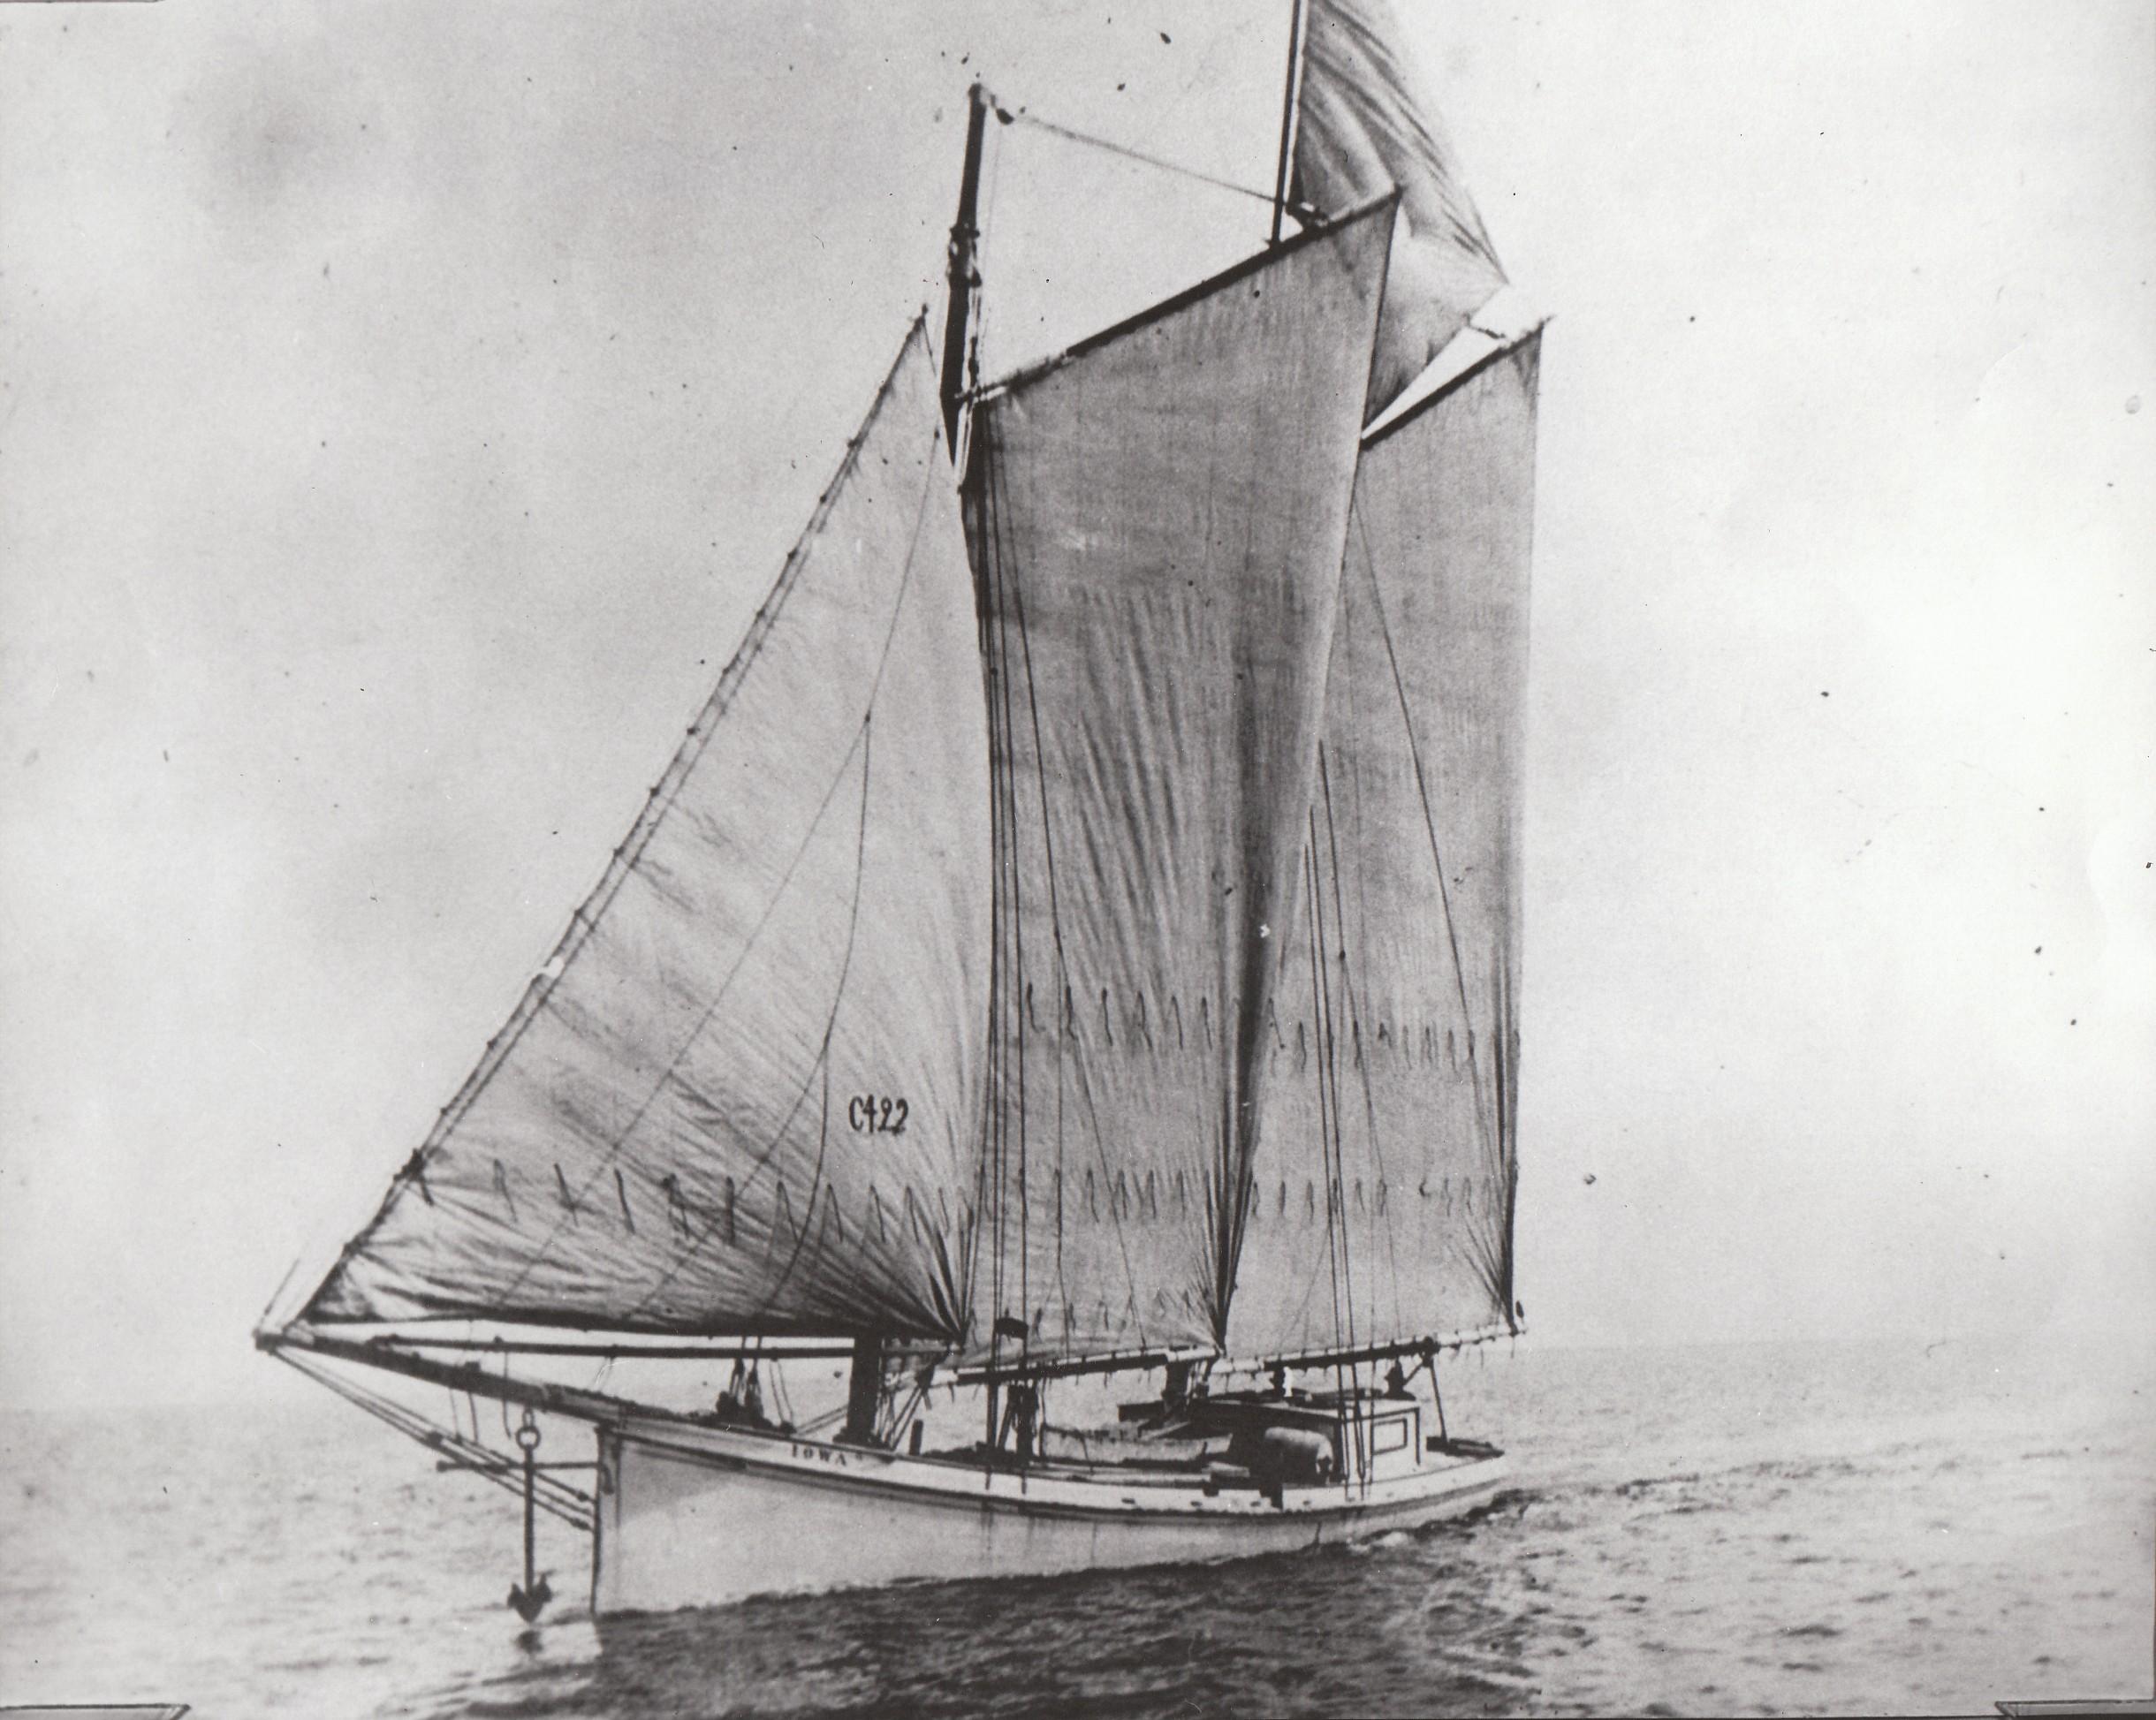 Sharpie Schooner Iowa Sister vessel to missouri